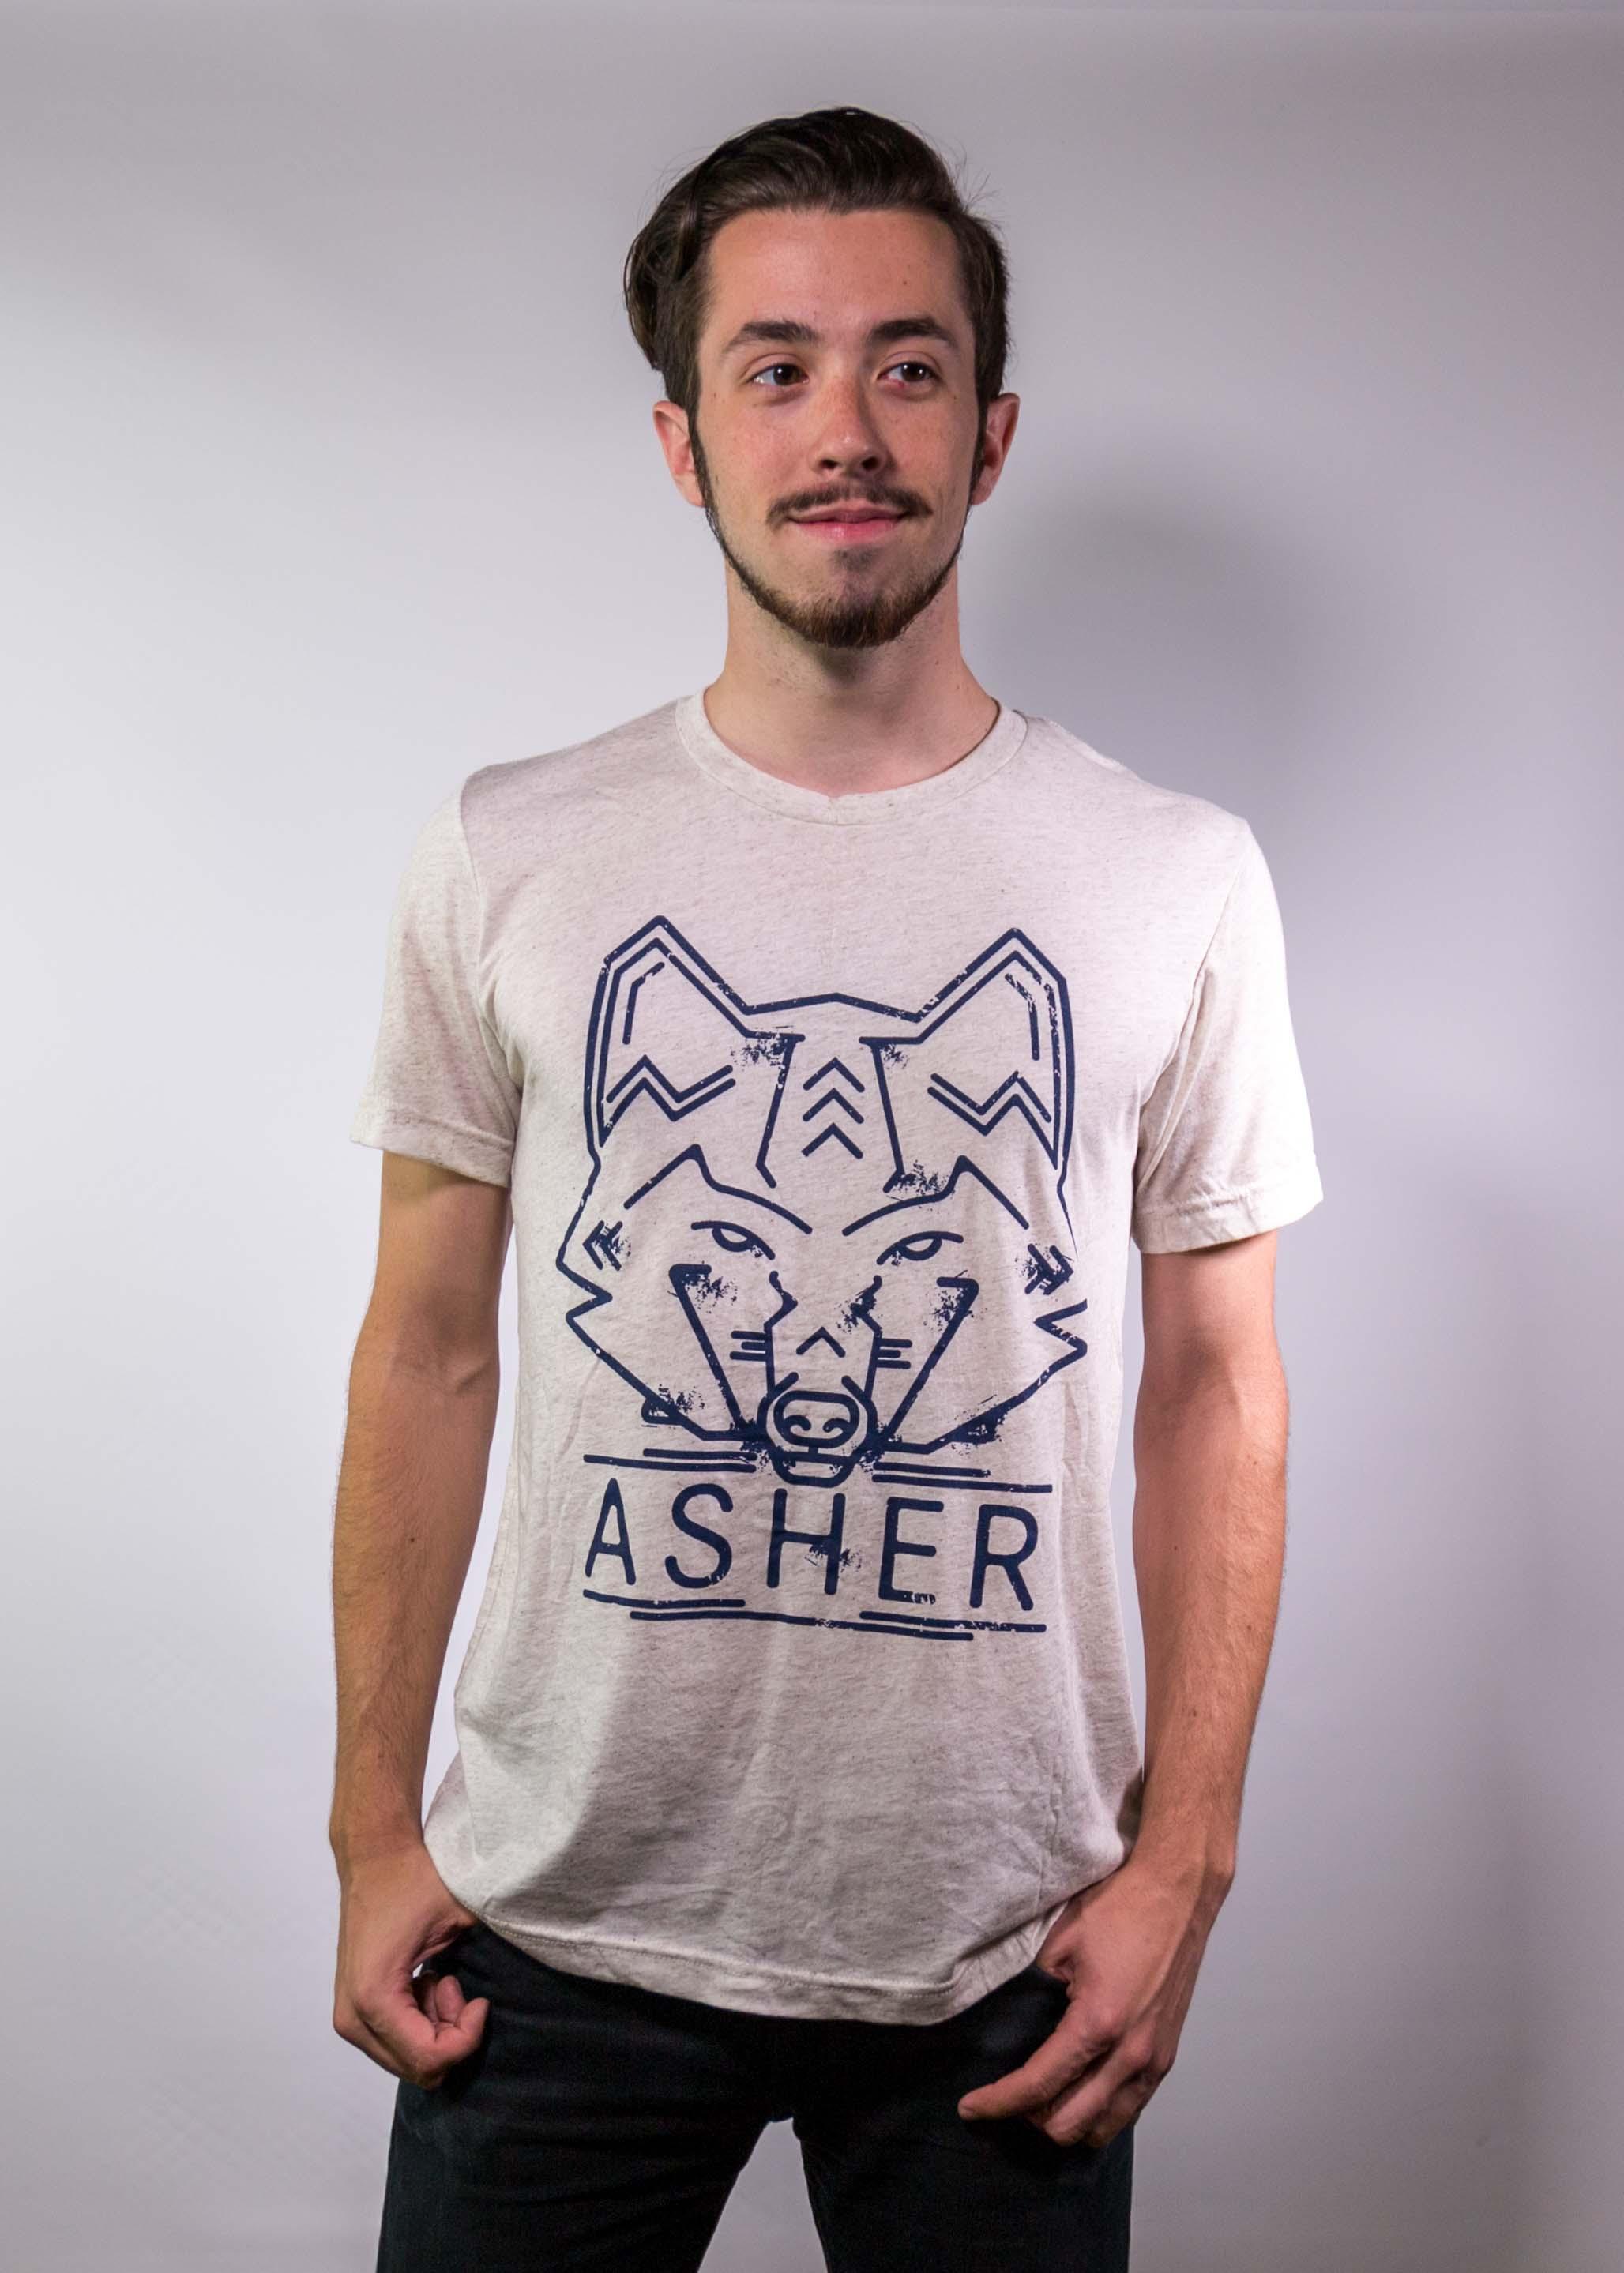 Asher Music T-Shirt